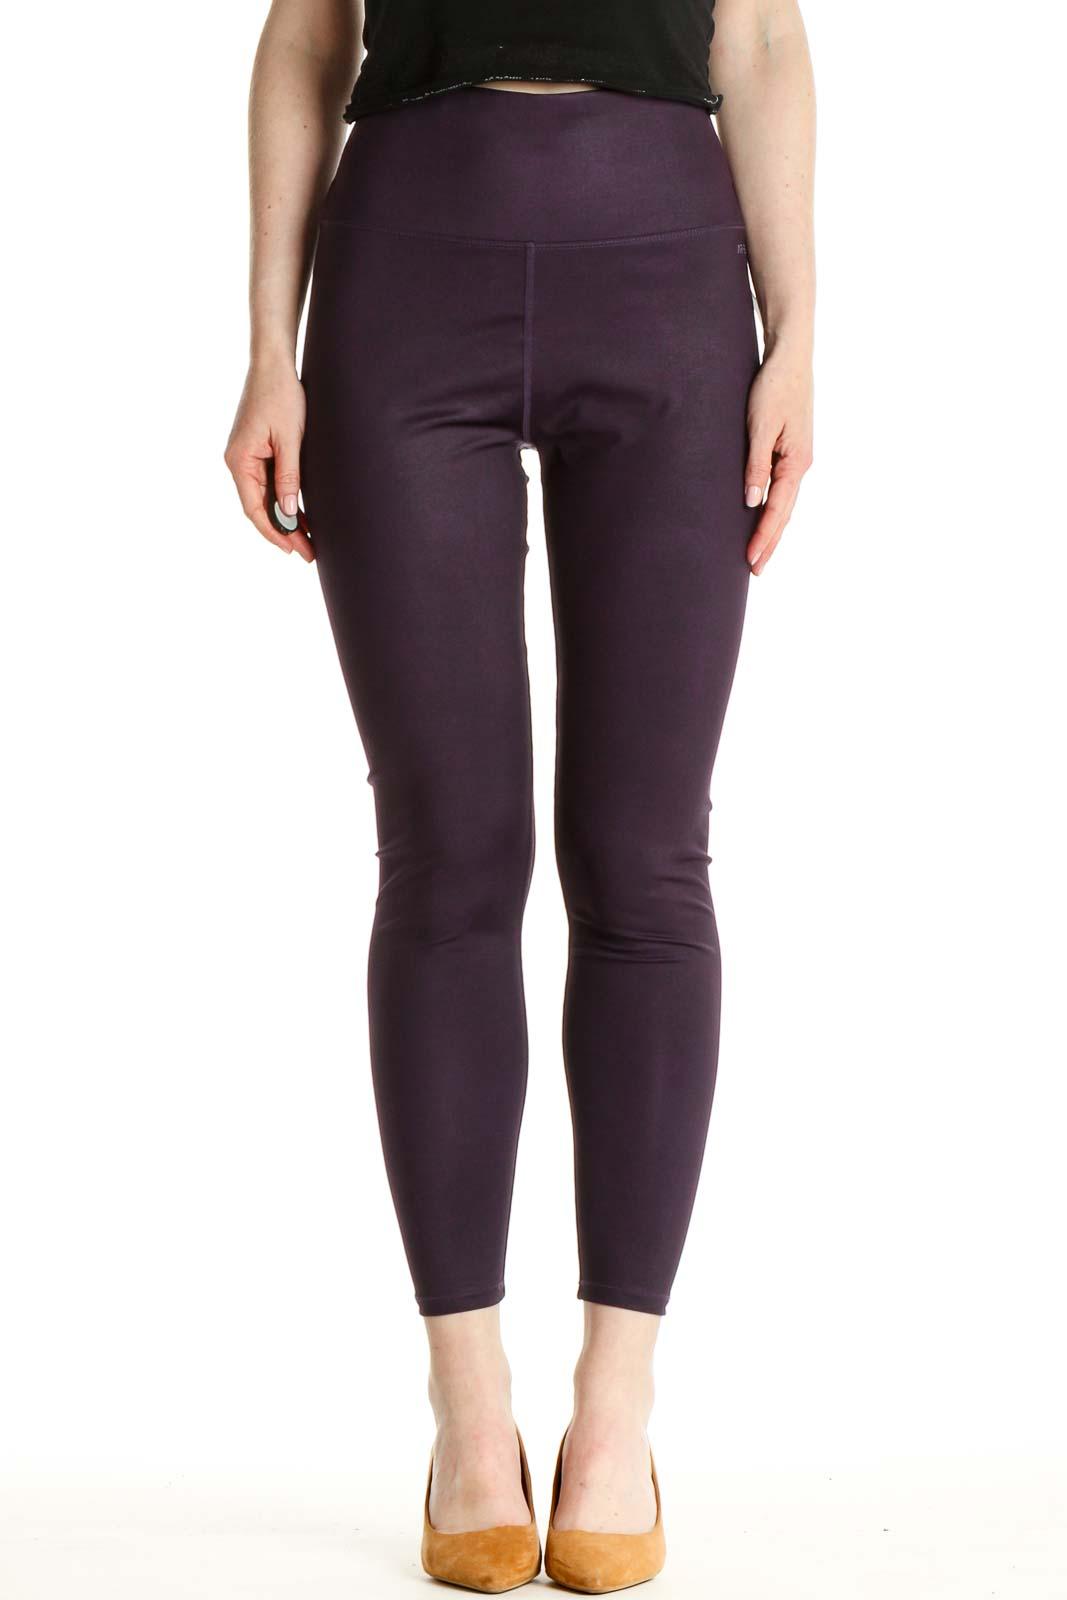 Purple Solid Activewear Leggings Front